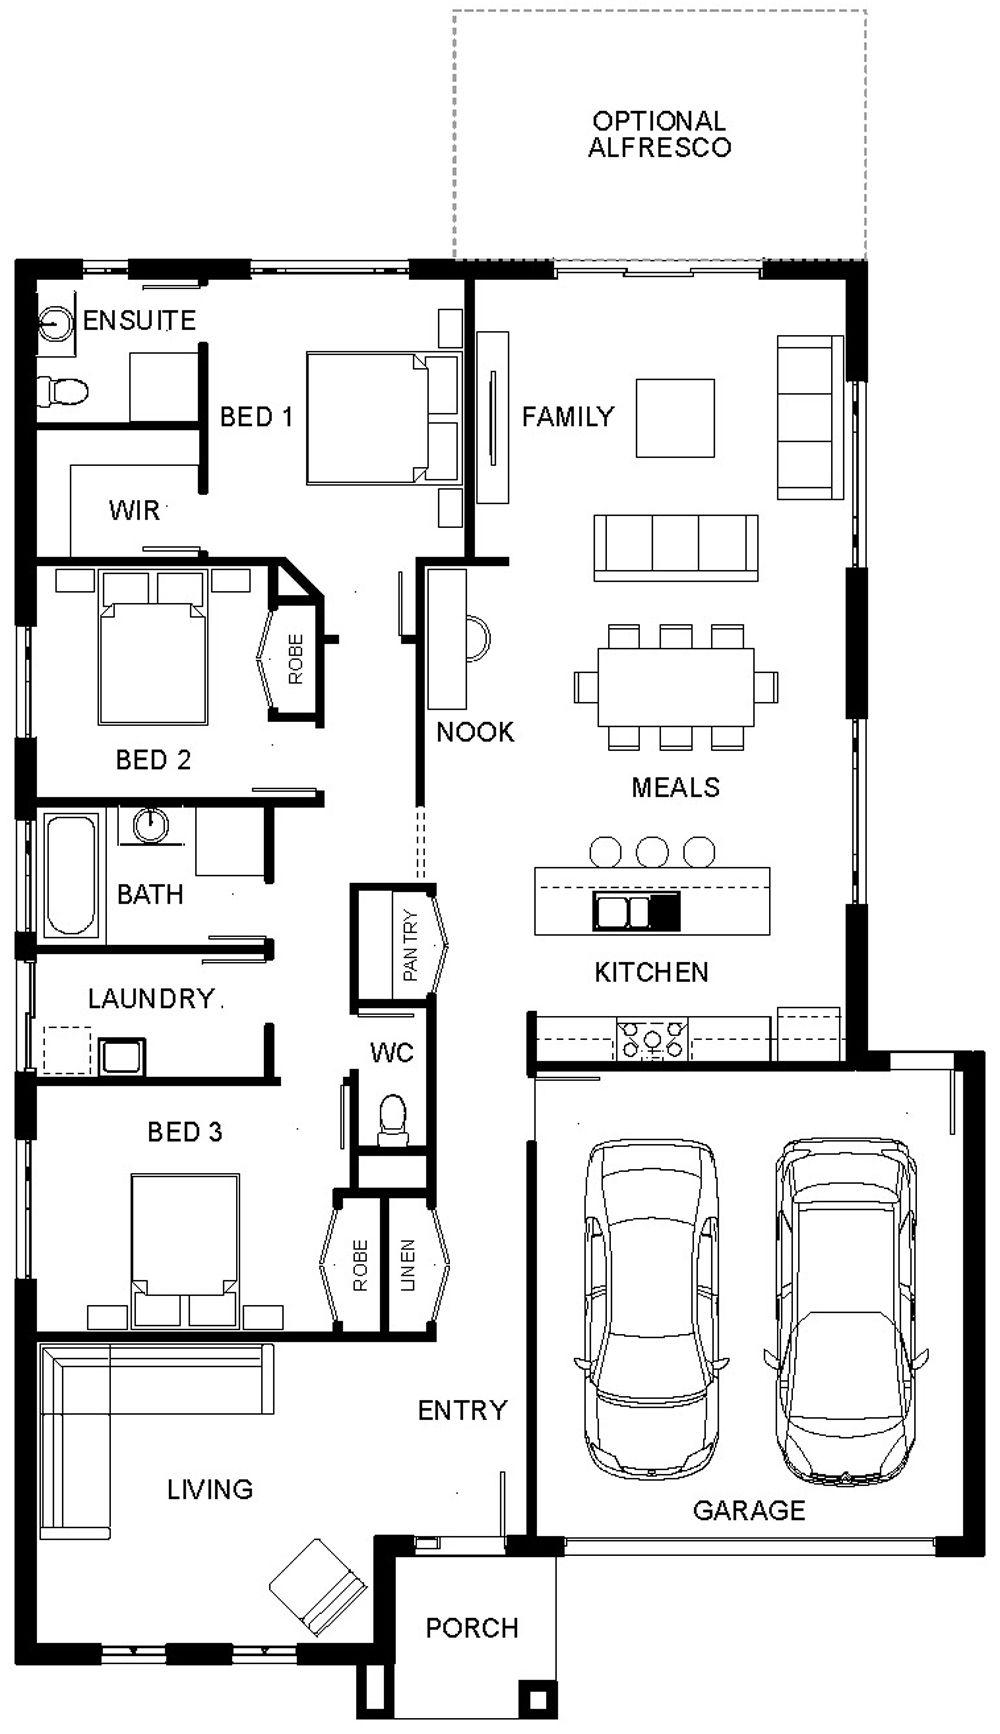 Floorplan Cora 1 Design Rumah Dream Homes Building A House Floor Plans